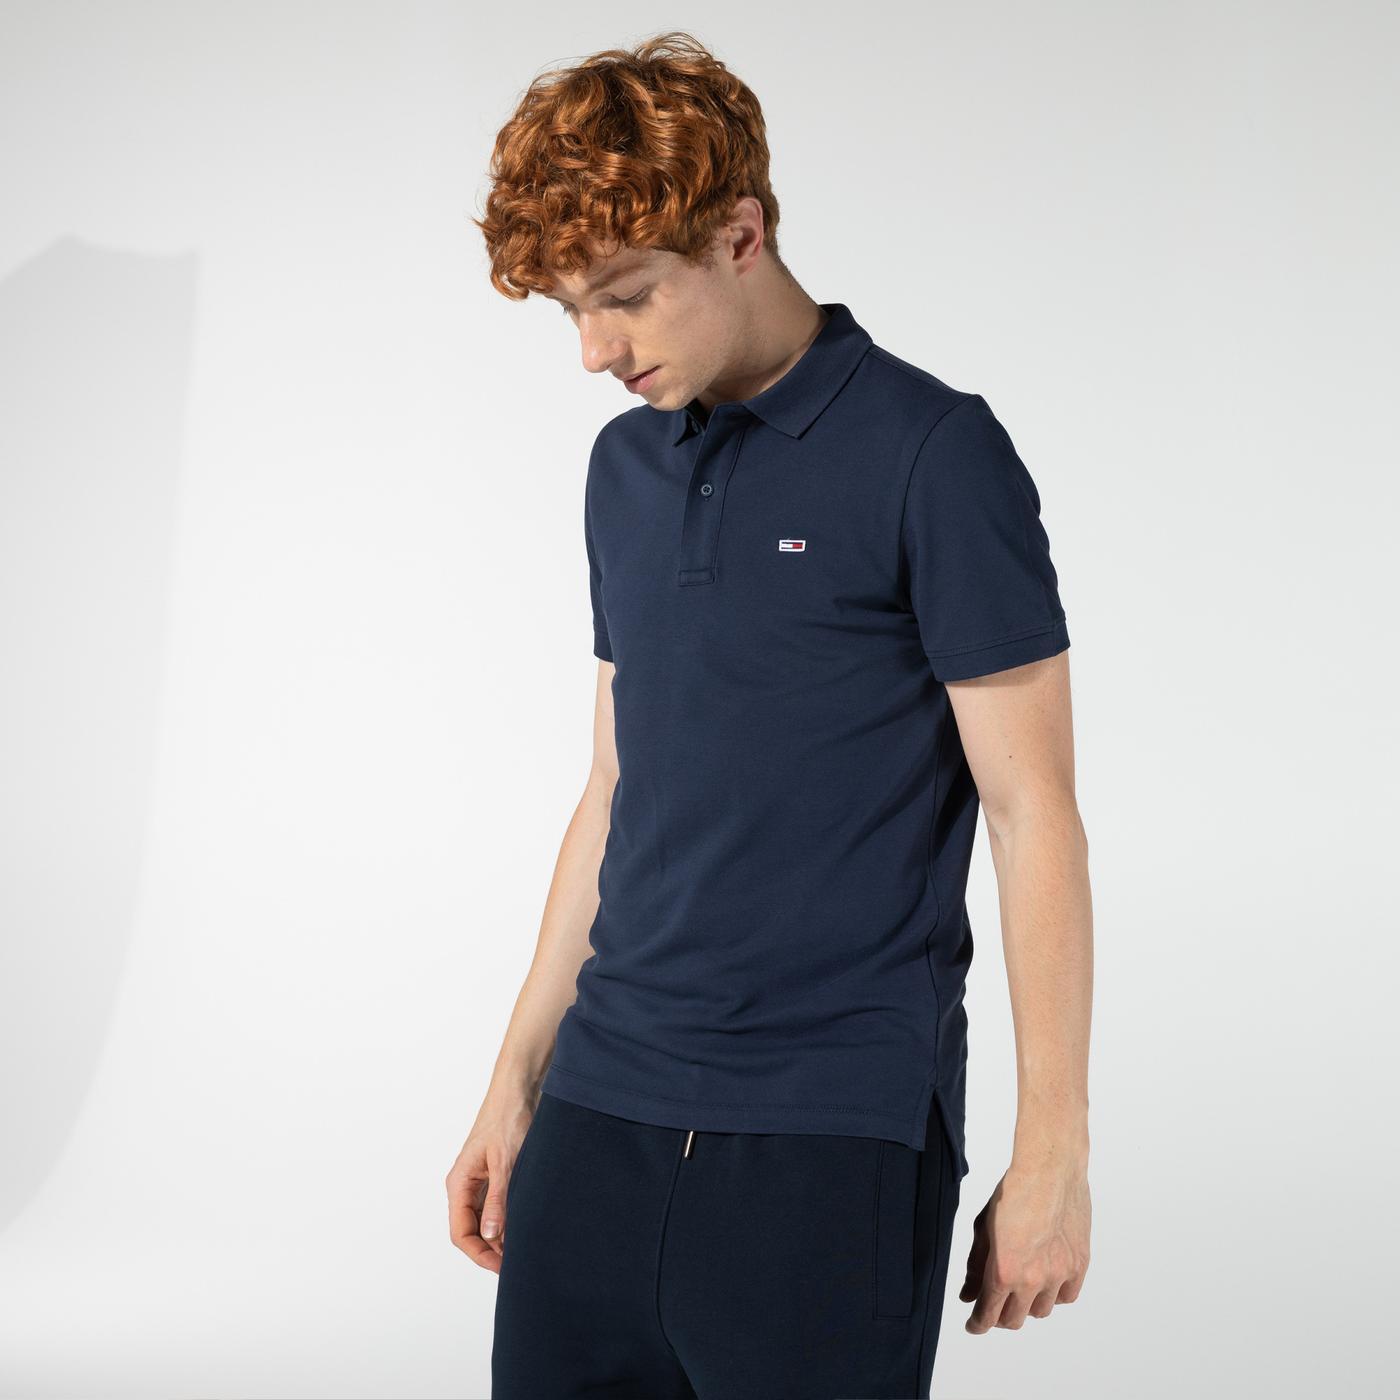 Tommy Hilfiger TJM Classics Solid Stretch Erkek Lacivert Polo